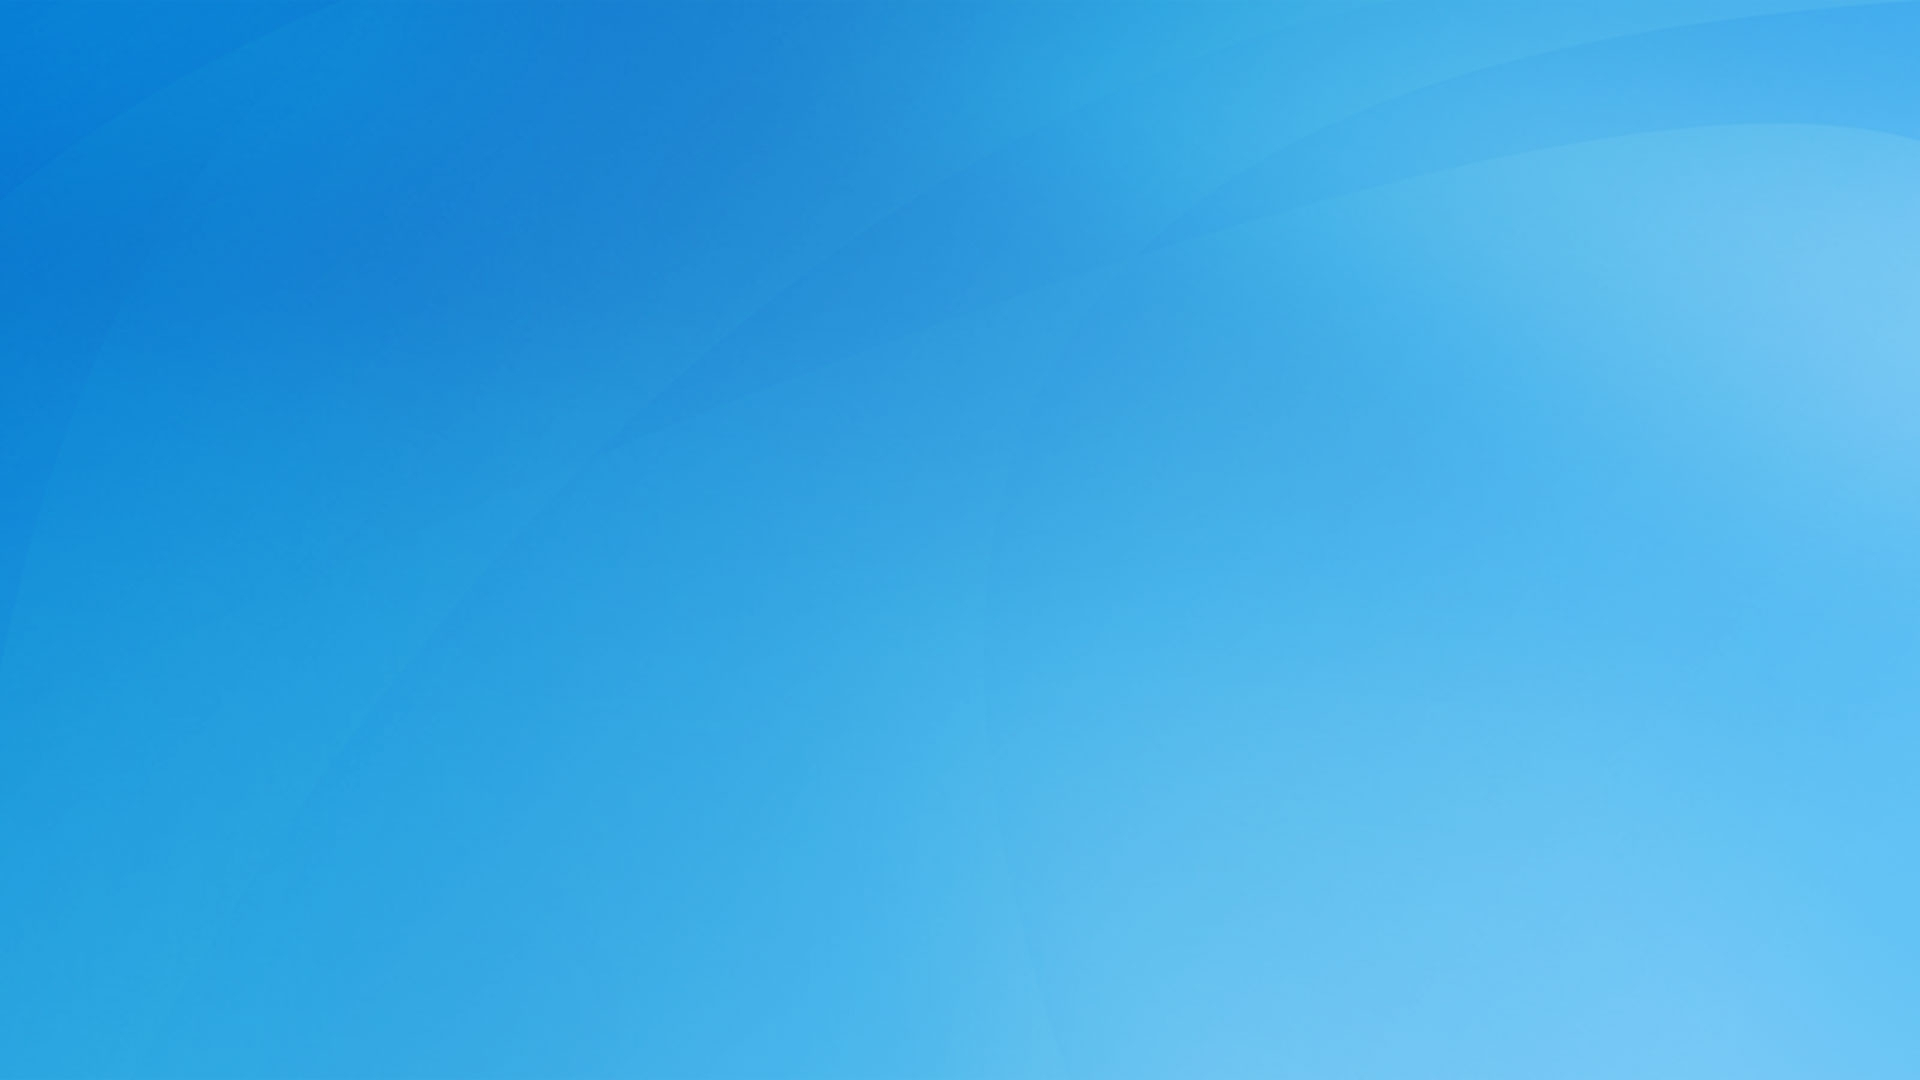 plain-light-blue-background-1920x1080 - wallpaper.wiki